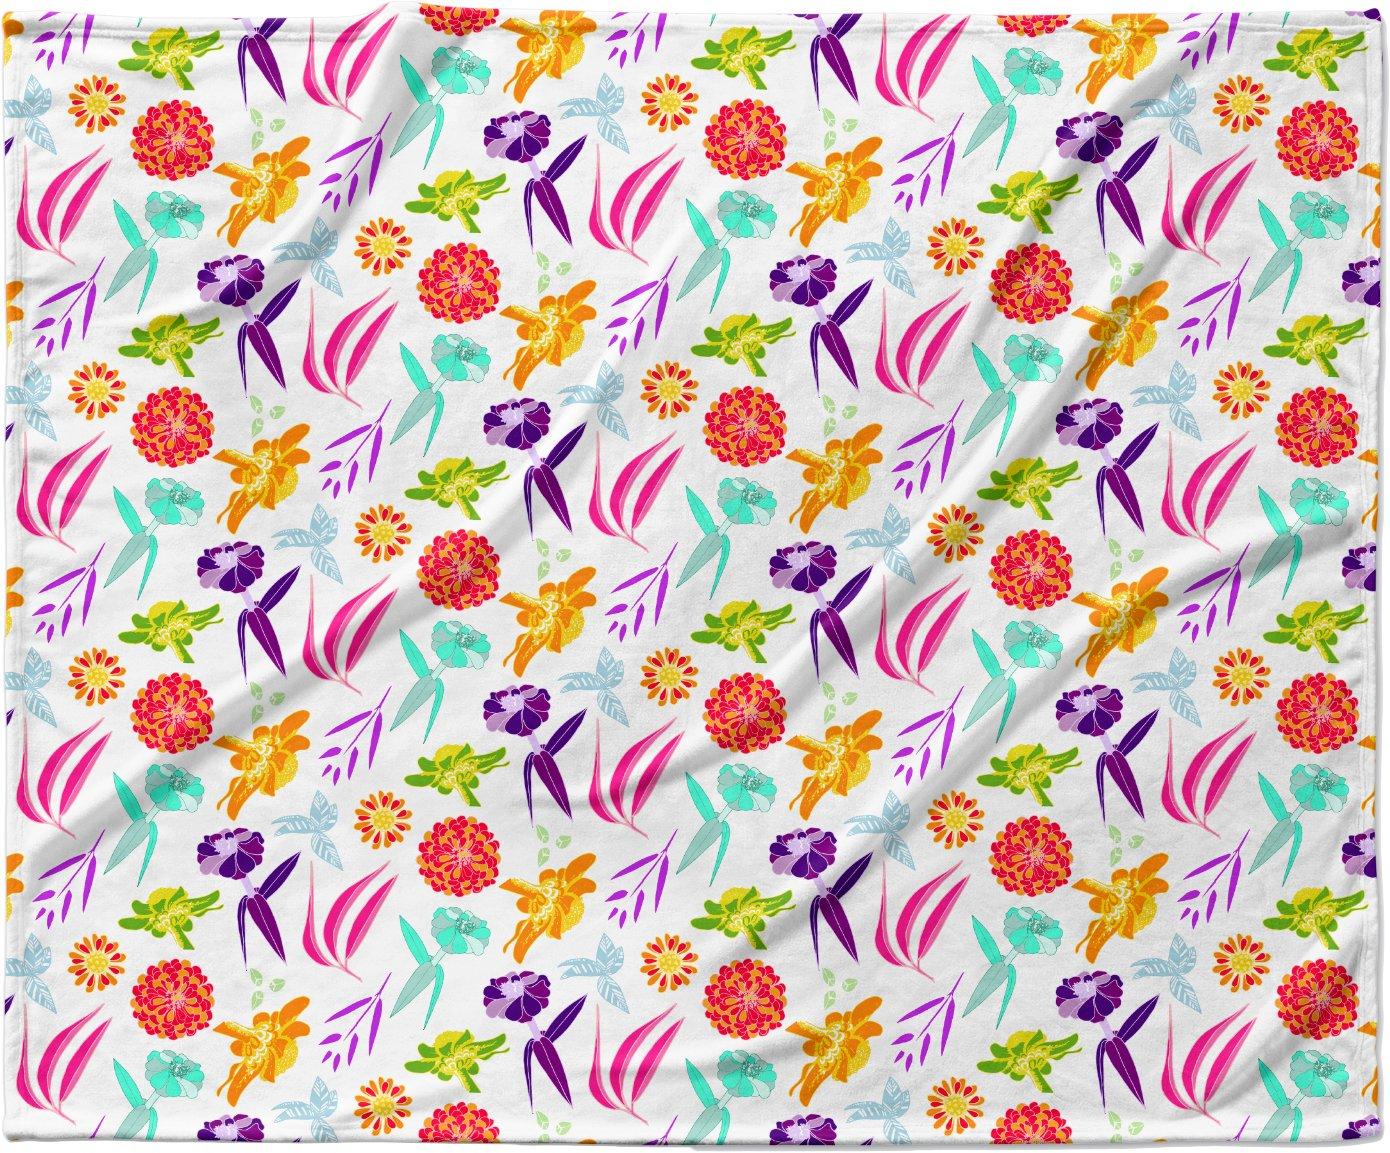 40 x 30 KESS InHouse Anchobee Iris Multicolor Pattern Fleece Baby Blanket